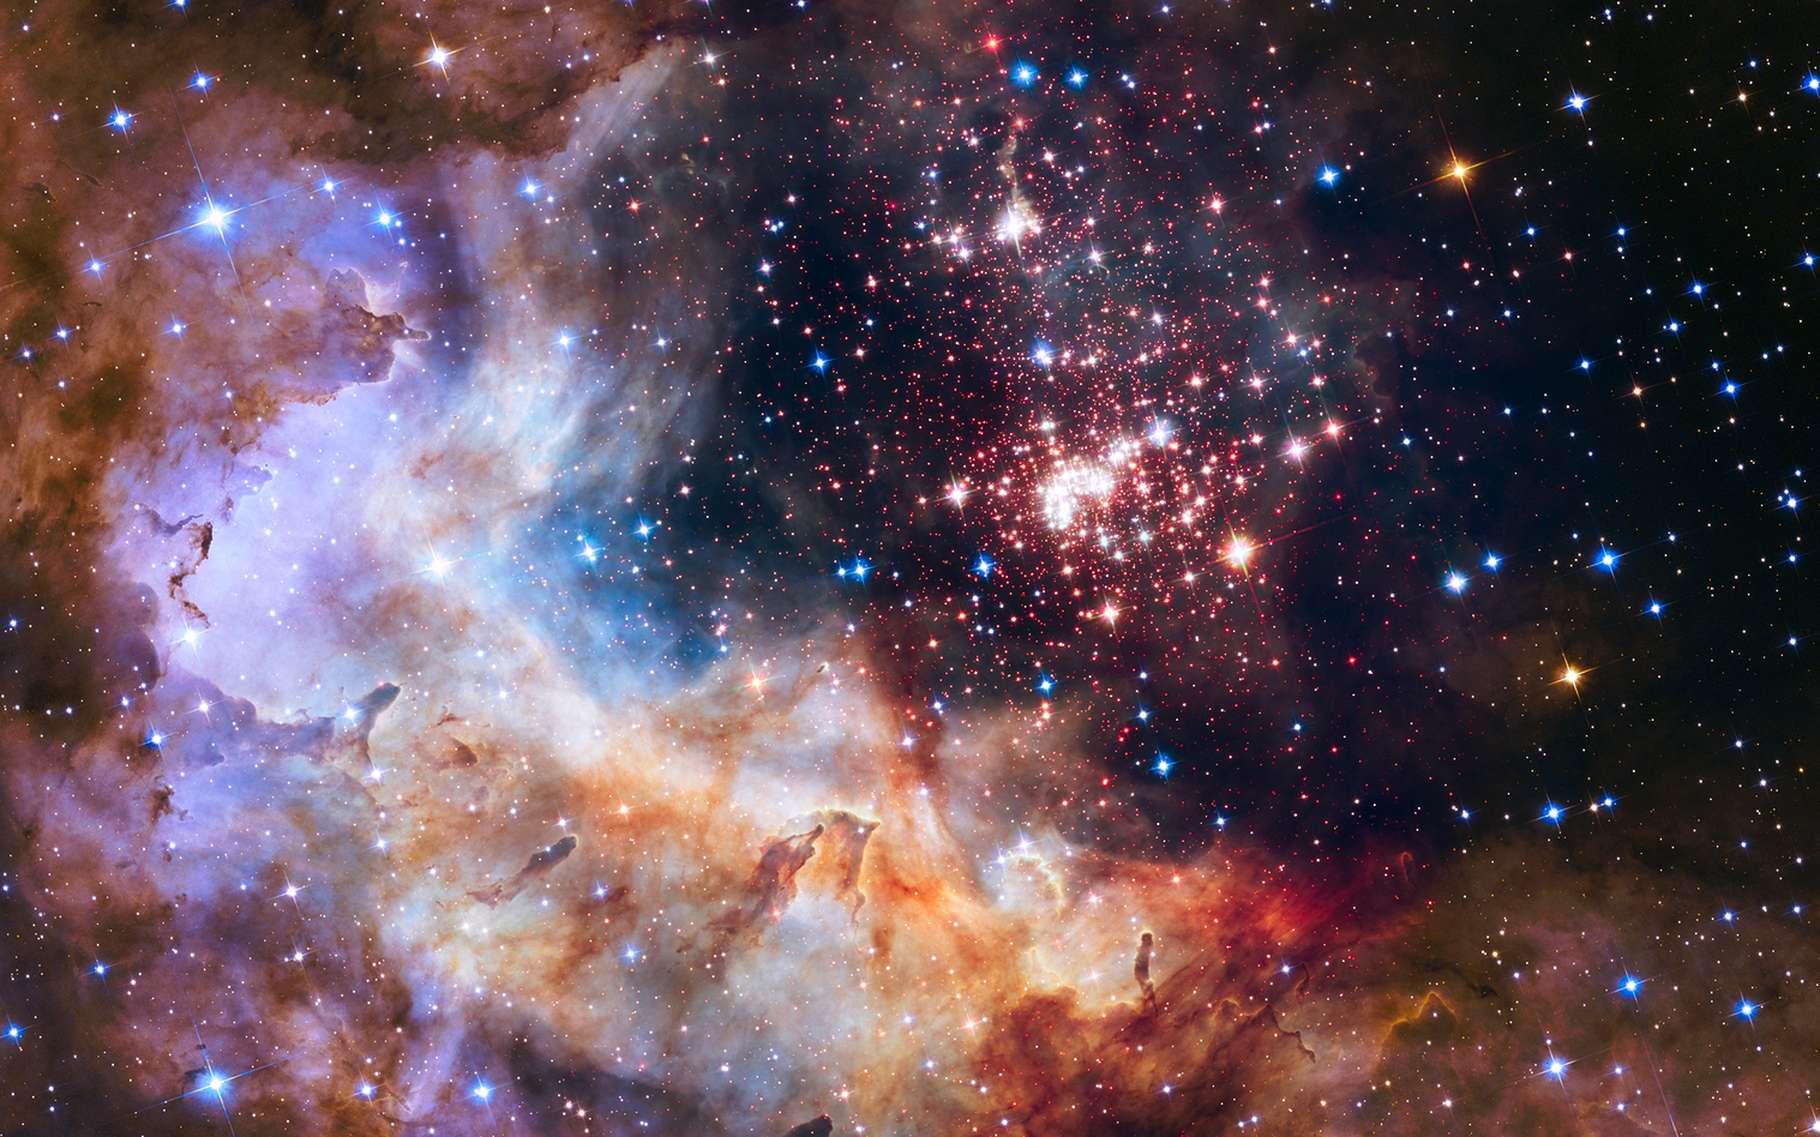 Amas d'étoiles dans la constellation de la Carène. © Yury Dmitrienko, Shuterstock